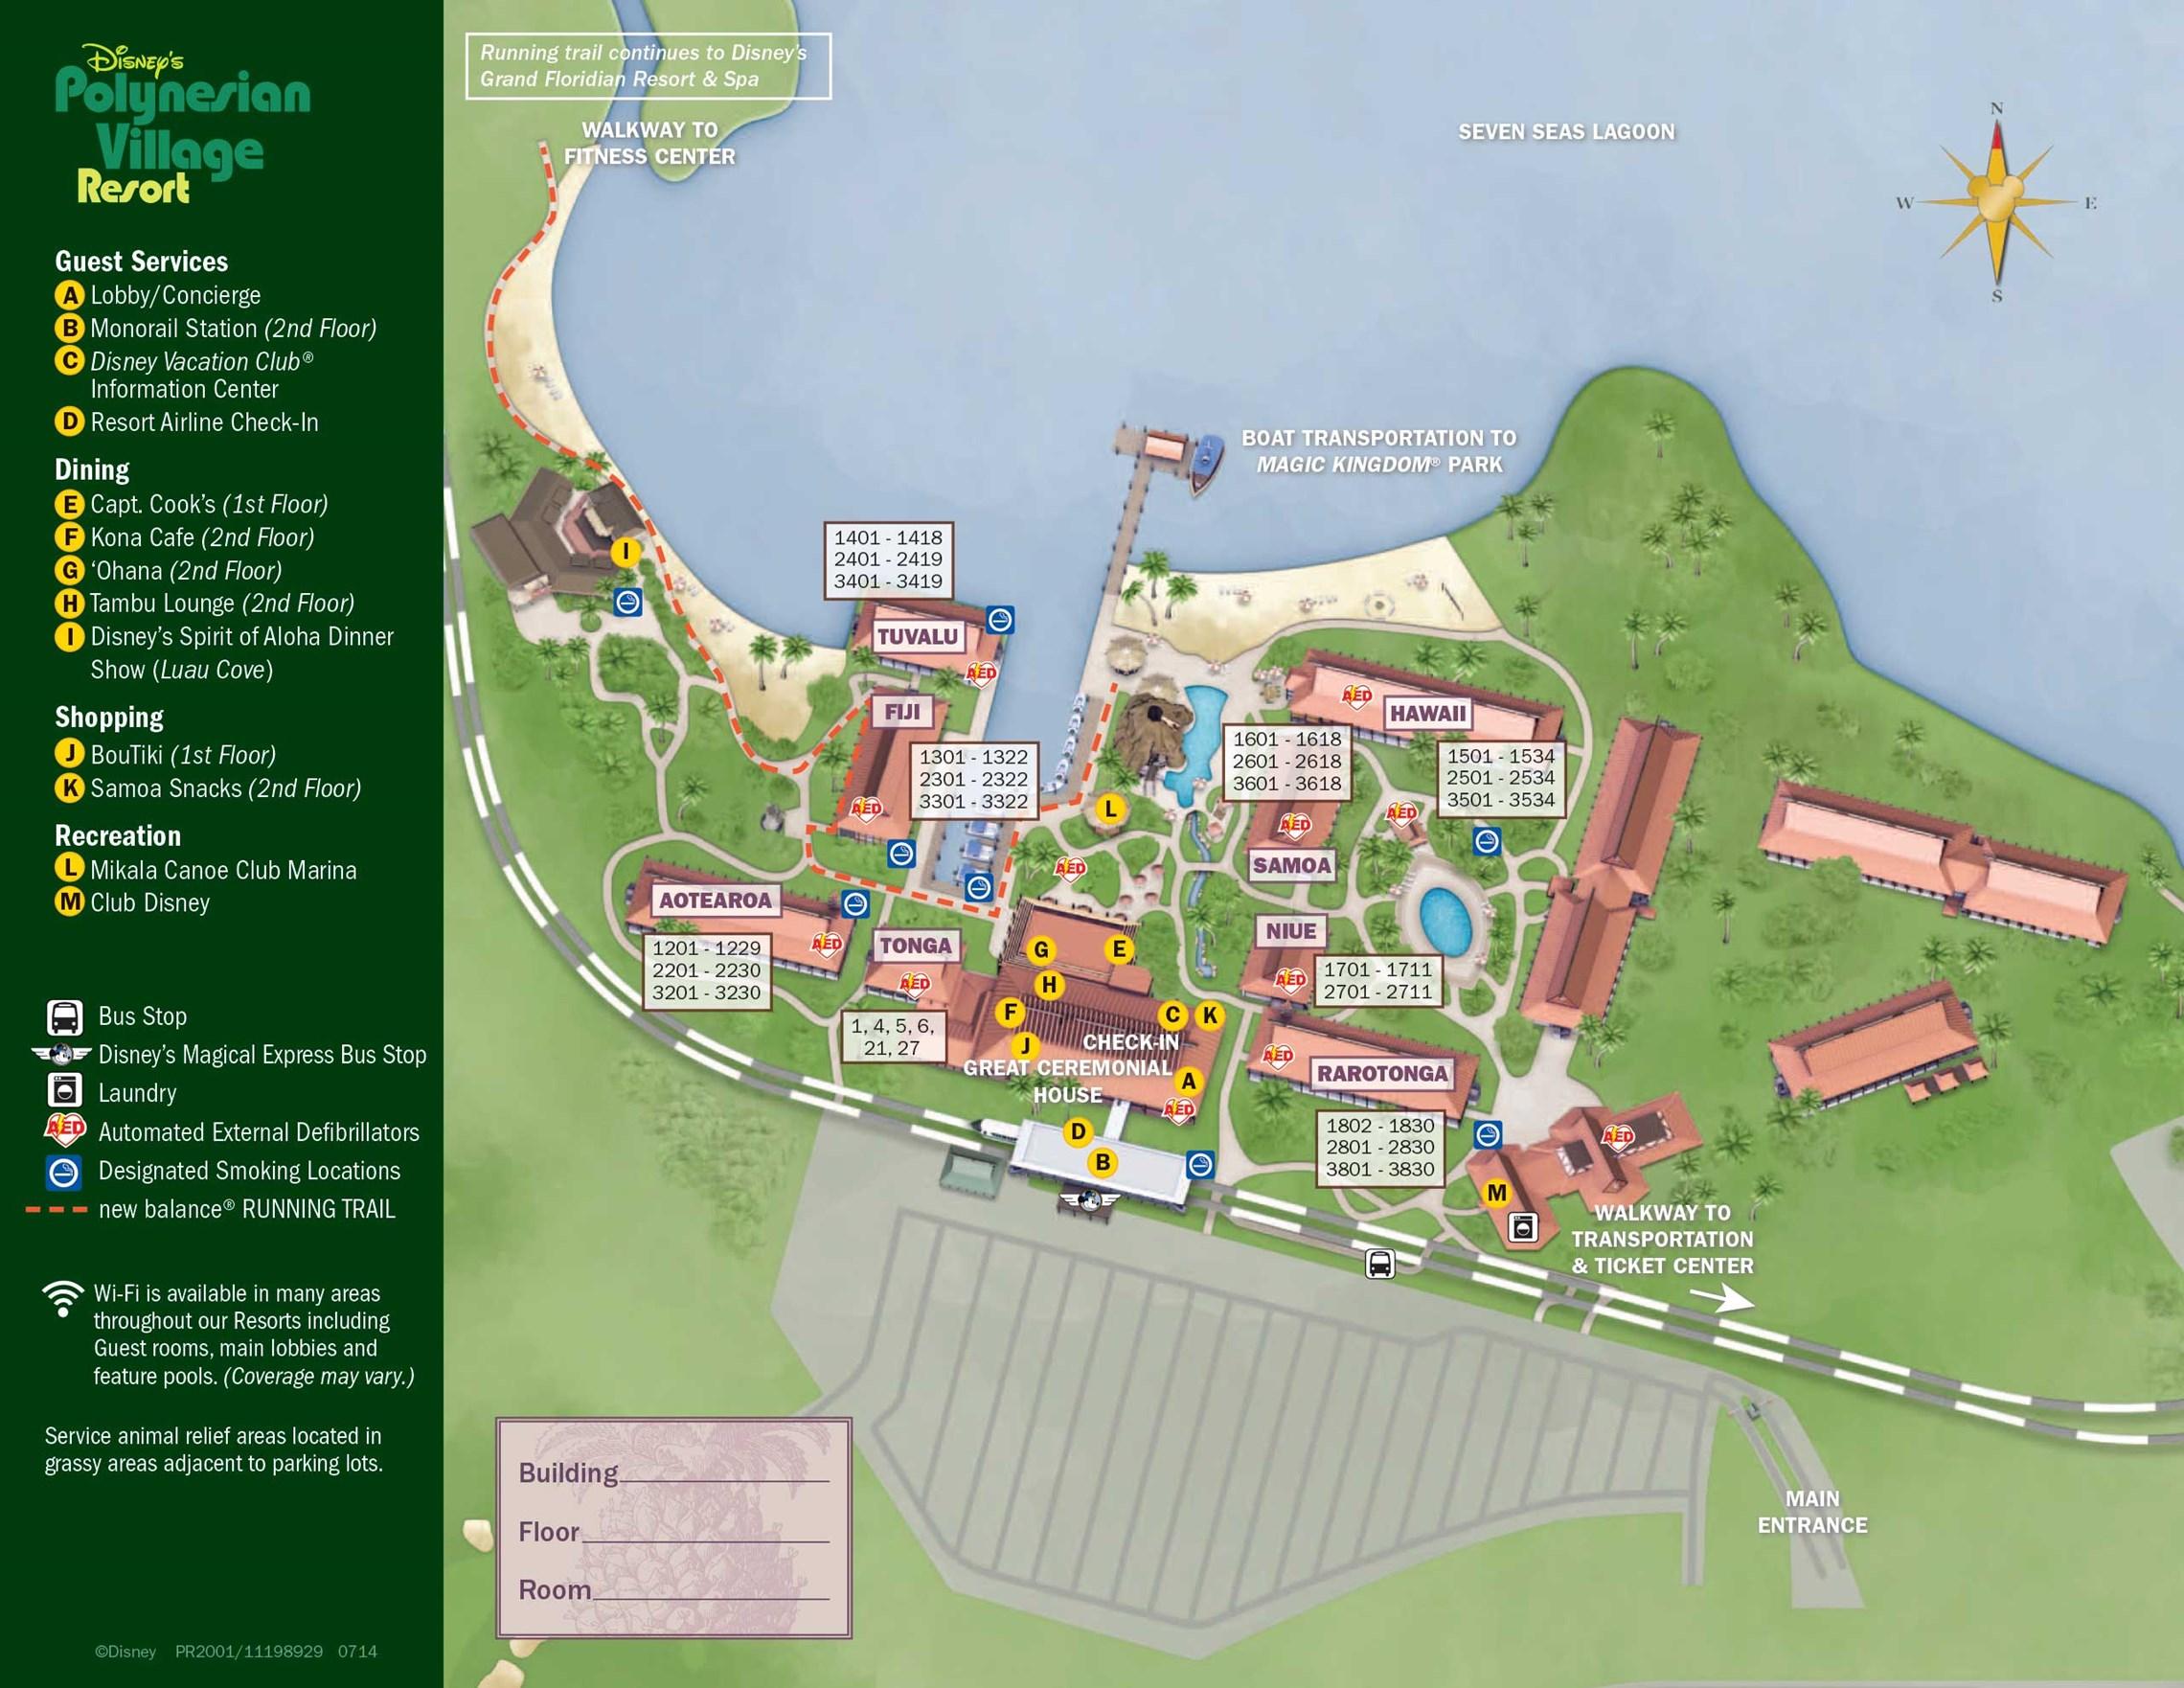 2014 Disney's Polynesian Village Resort guide map